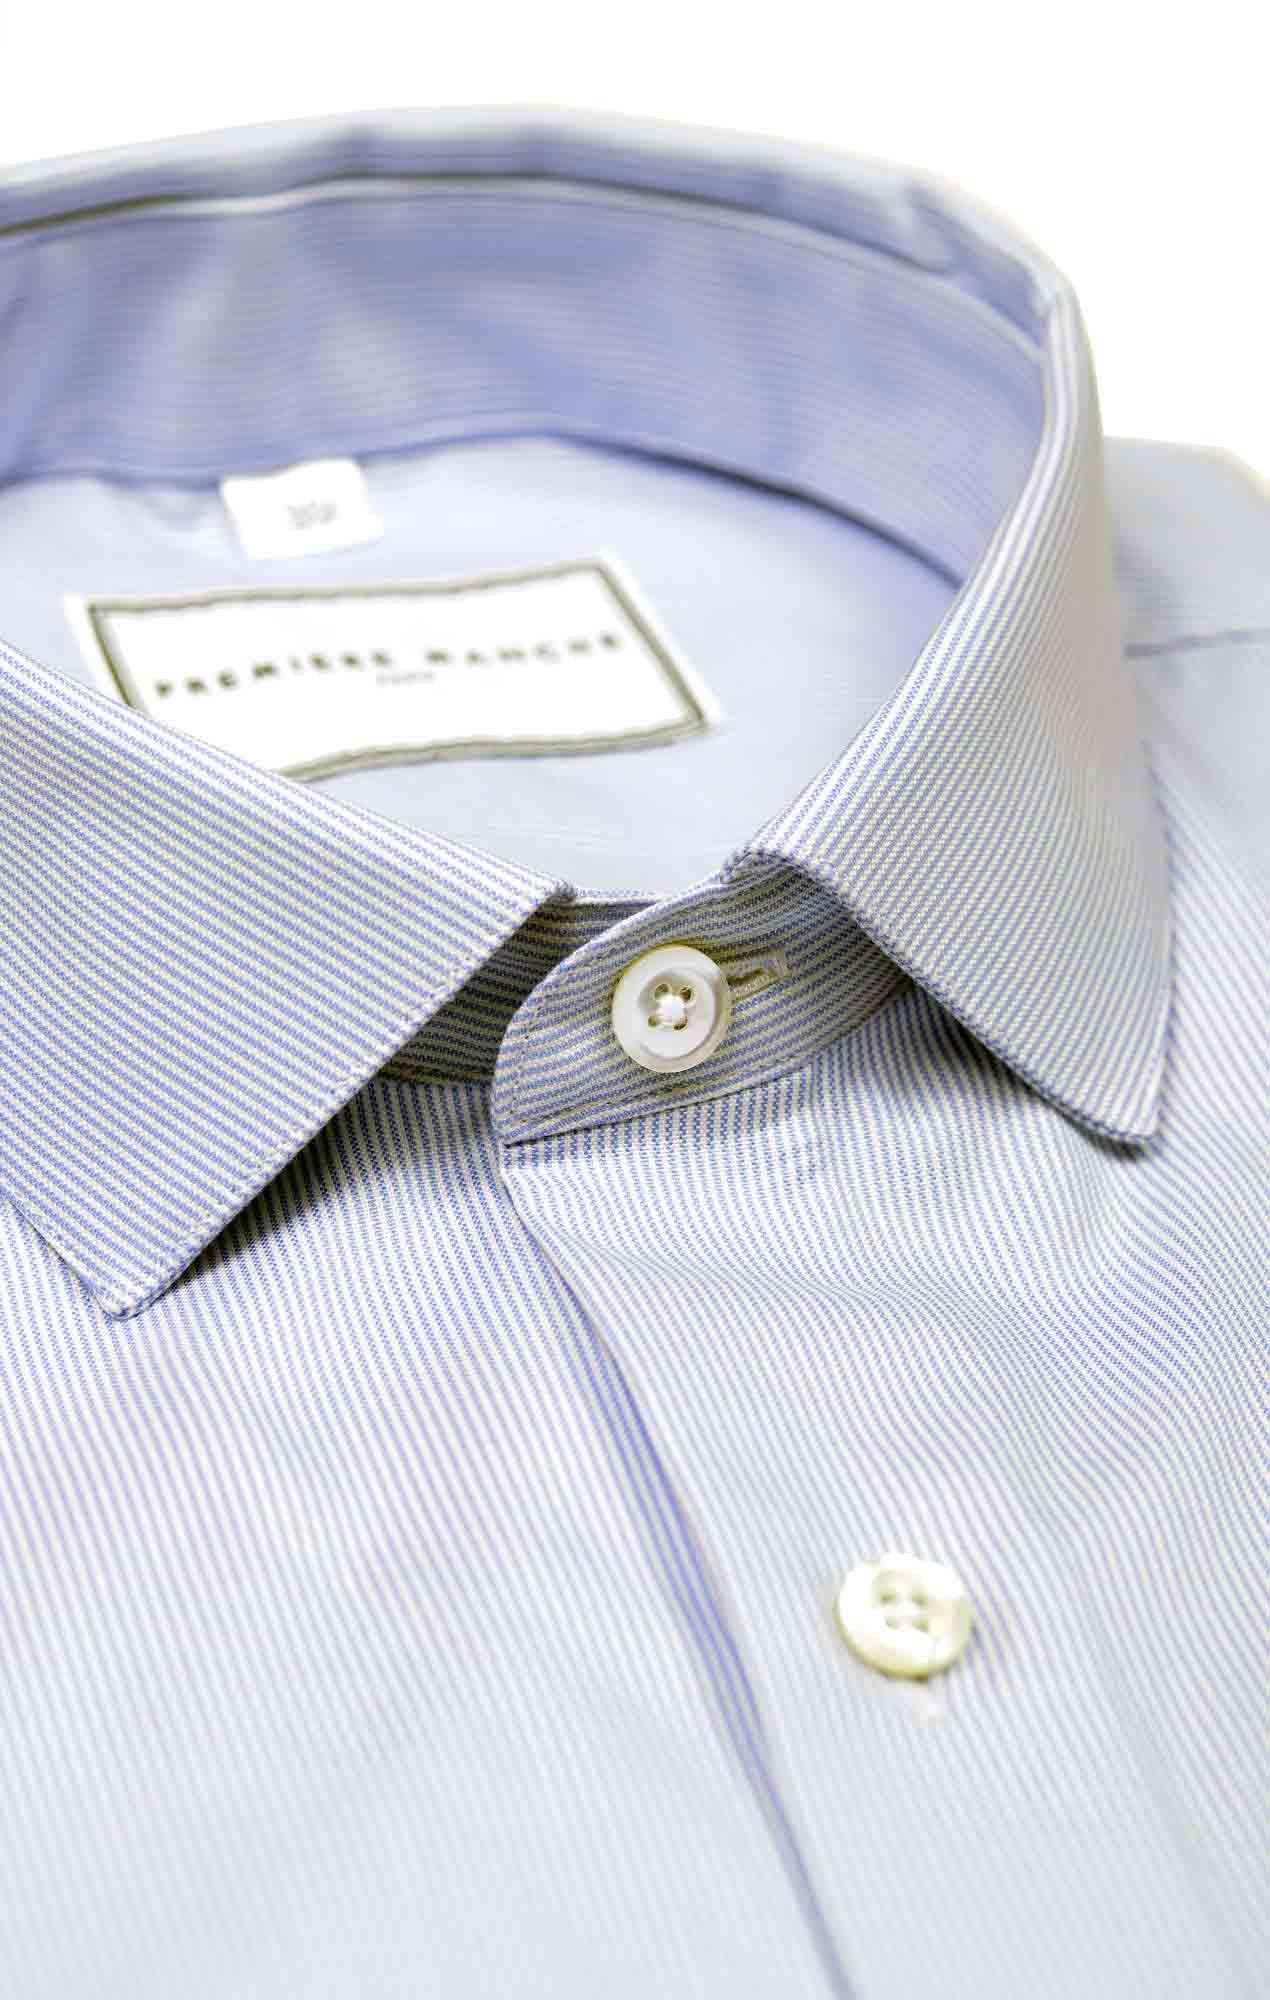 Chemise Oxford bleu rayé Chemises Hommes